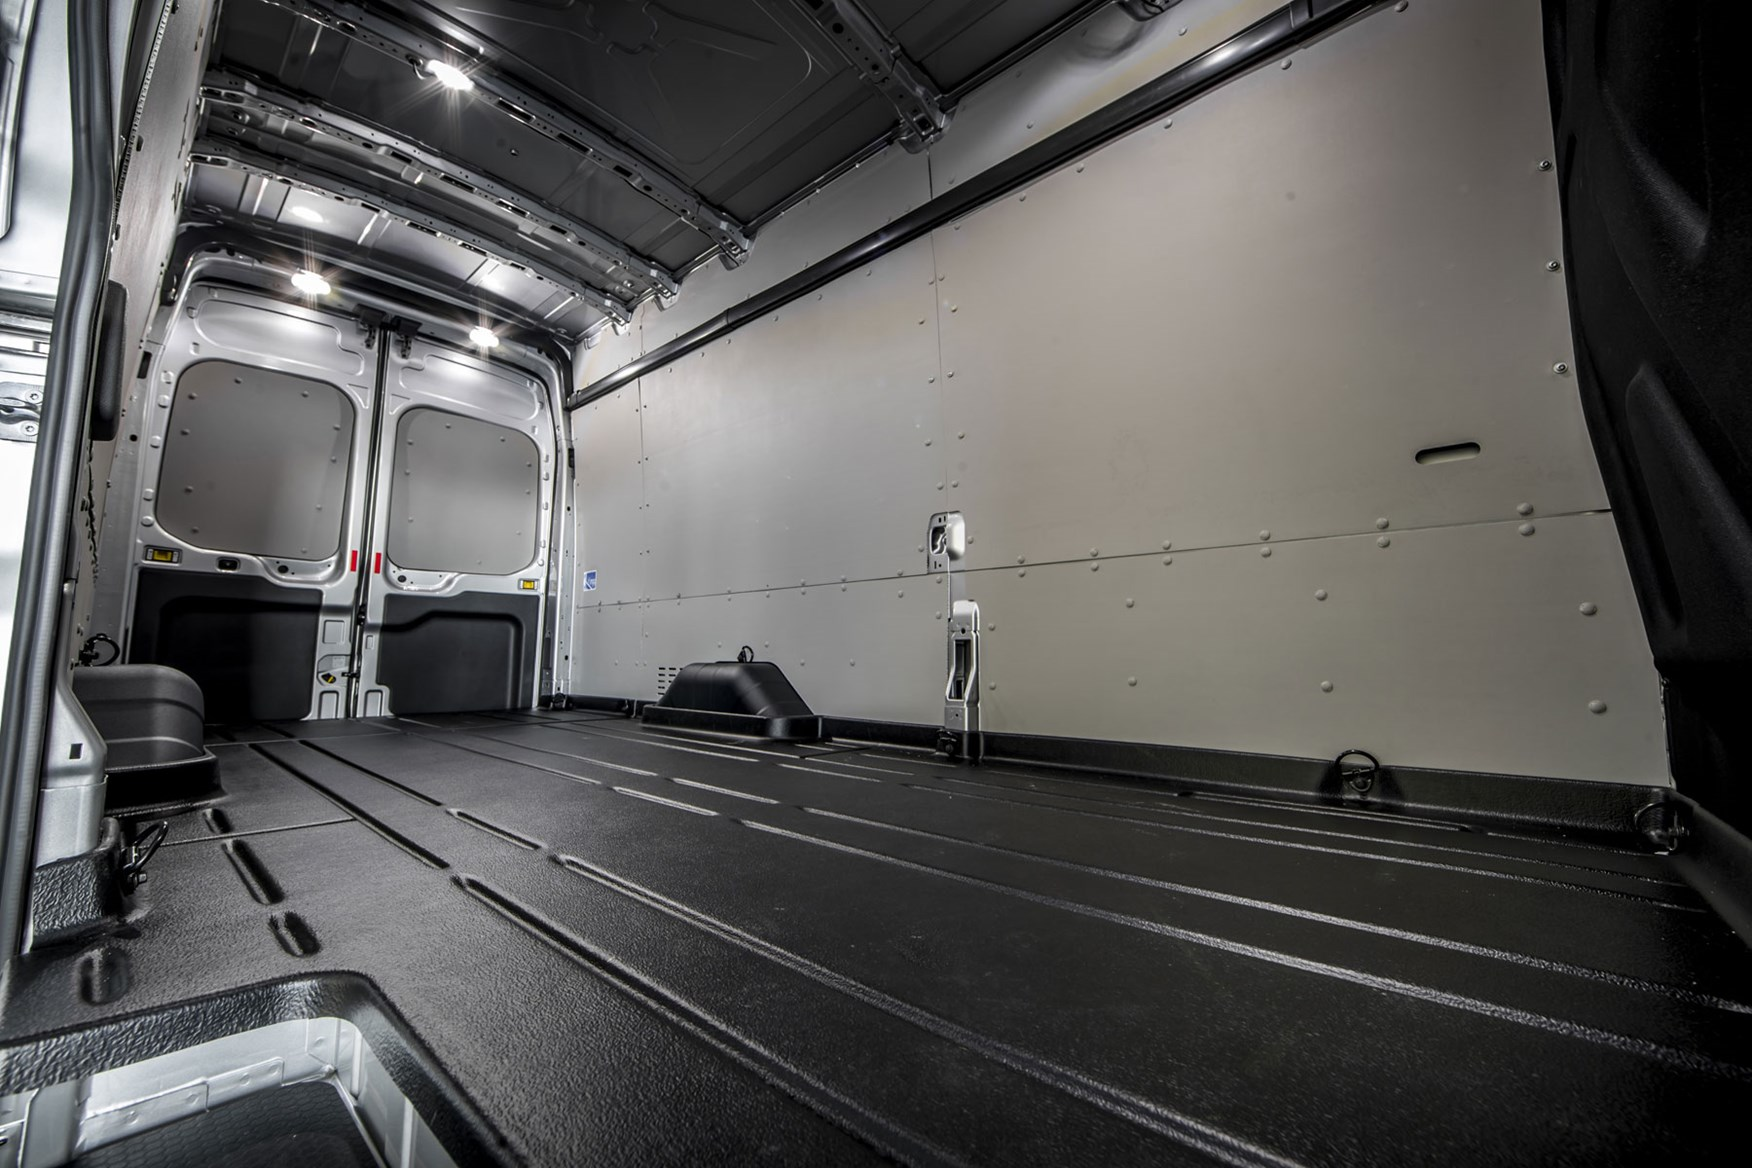 Ford Transit dimensions - 2019 facelift model, L4 load area